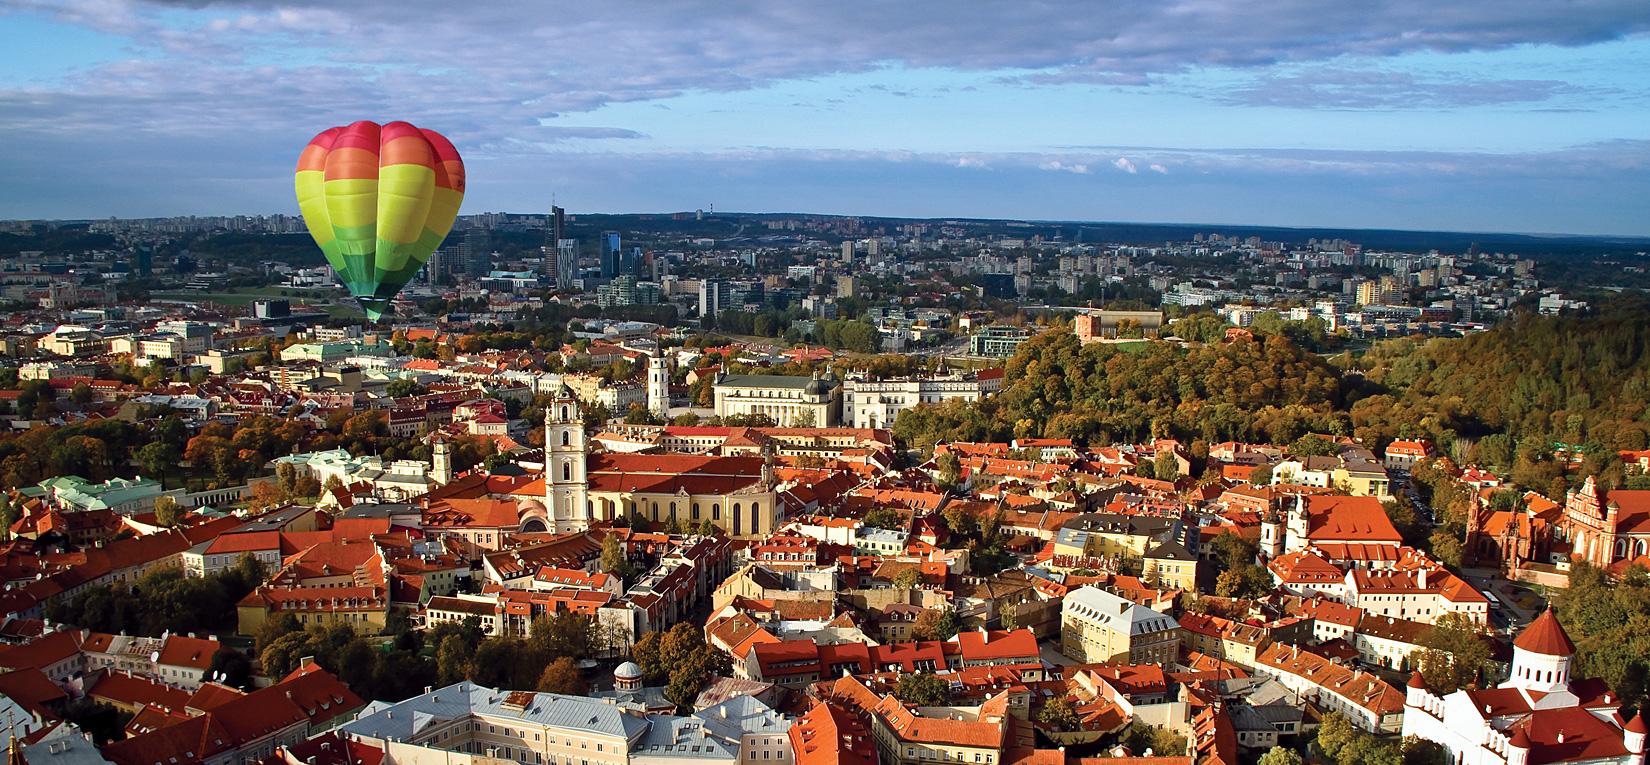 Воздушный шар над Вильнюсом